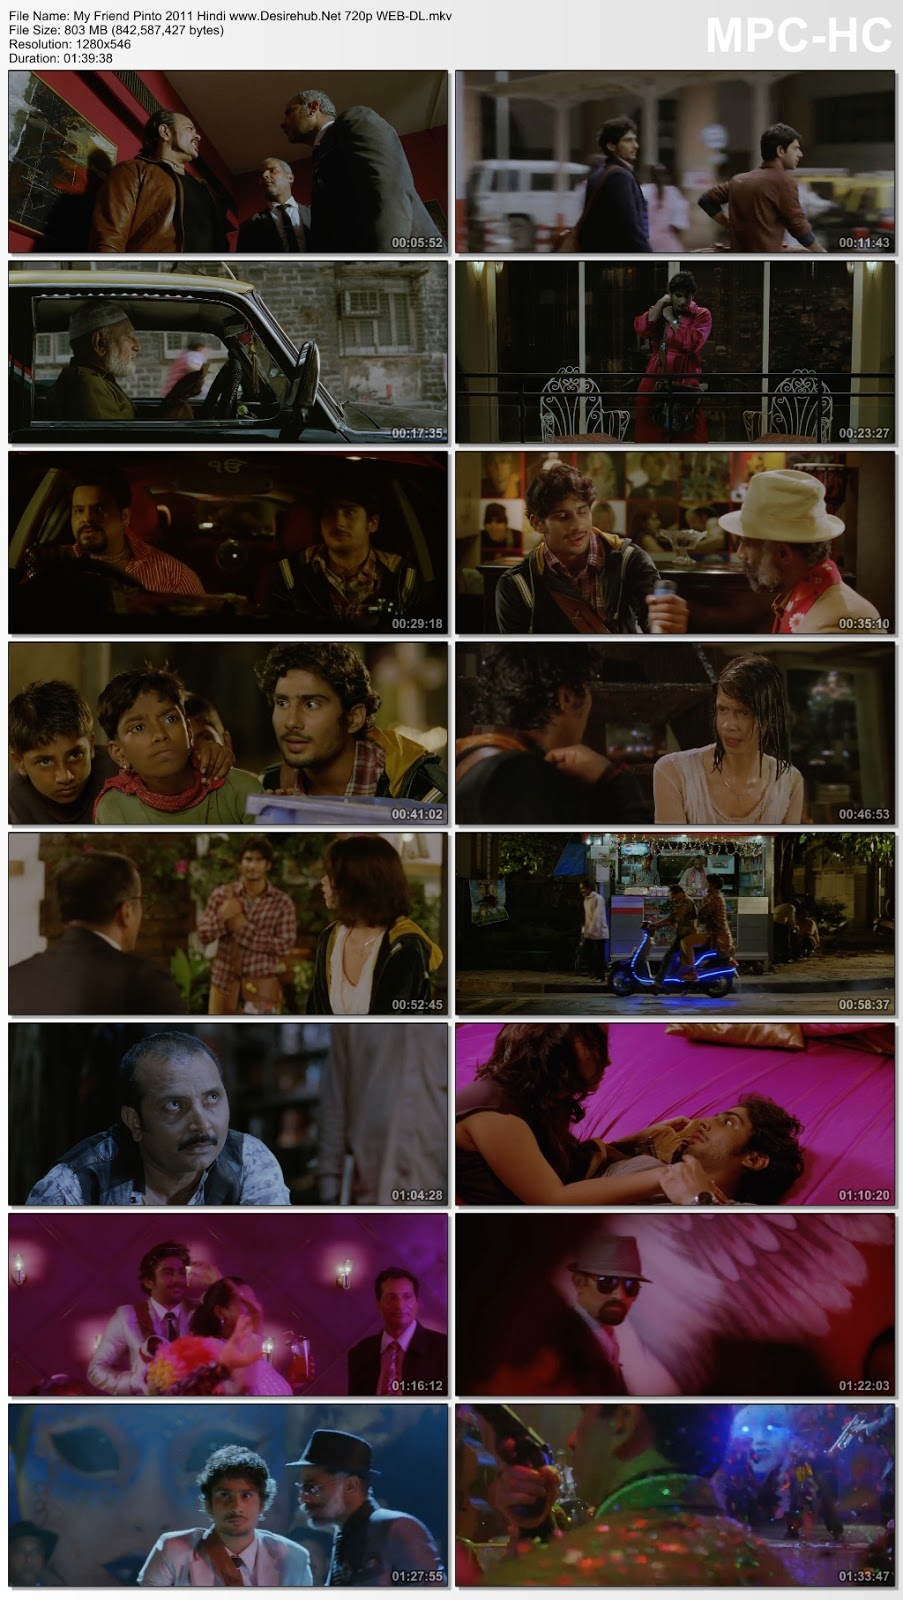 My Friend Pinto (2011) Hindi 720p WEB-DL 800MB Desirehub